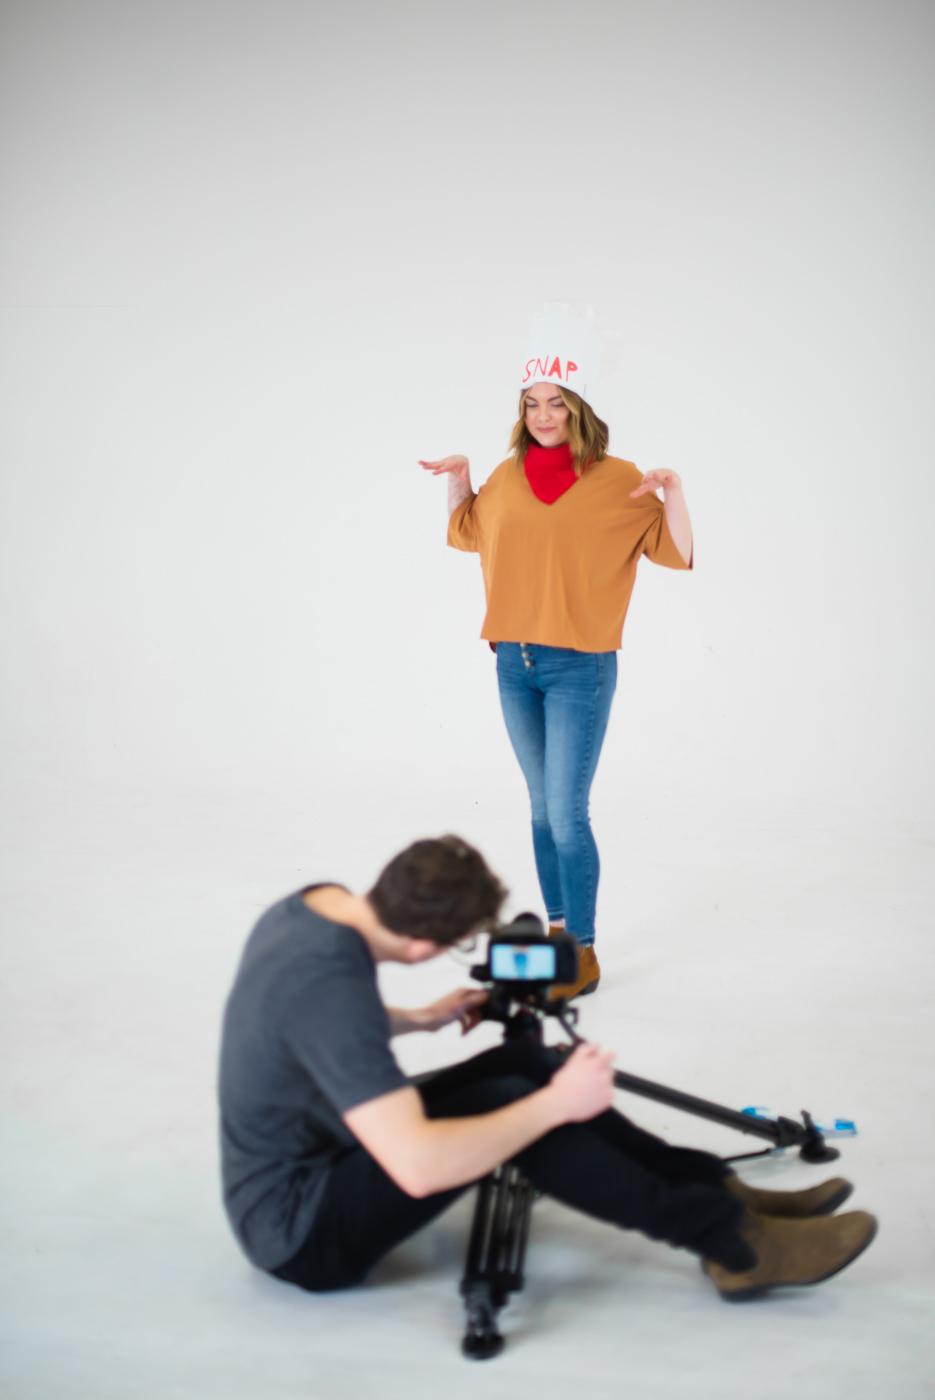 PHOCO Christmas Card Colorado Fort Collins Photographer Snap Crackle Pop BTS-20.jpg